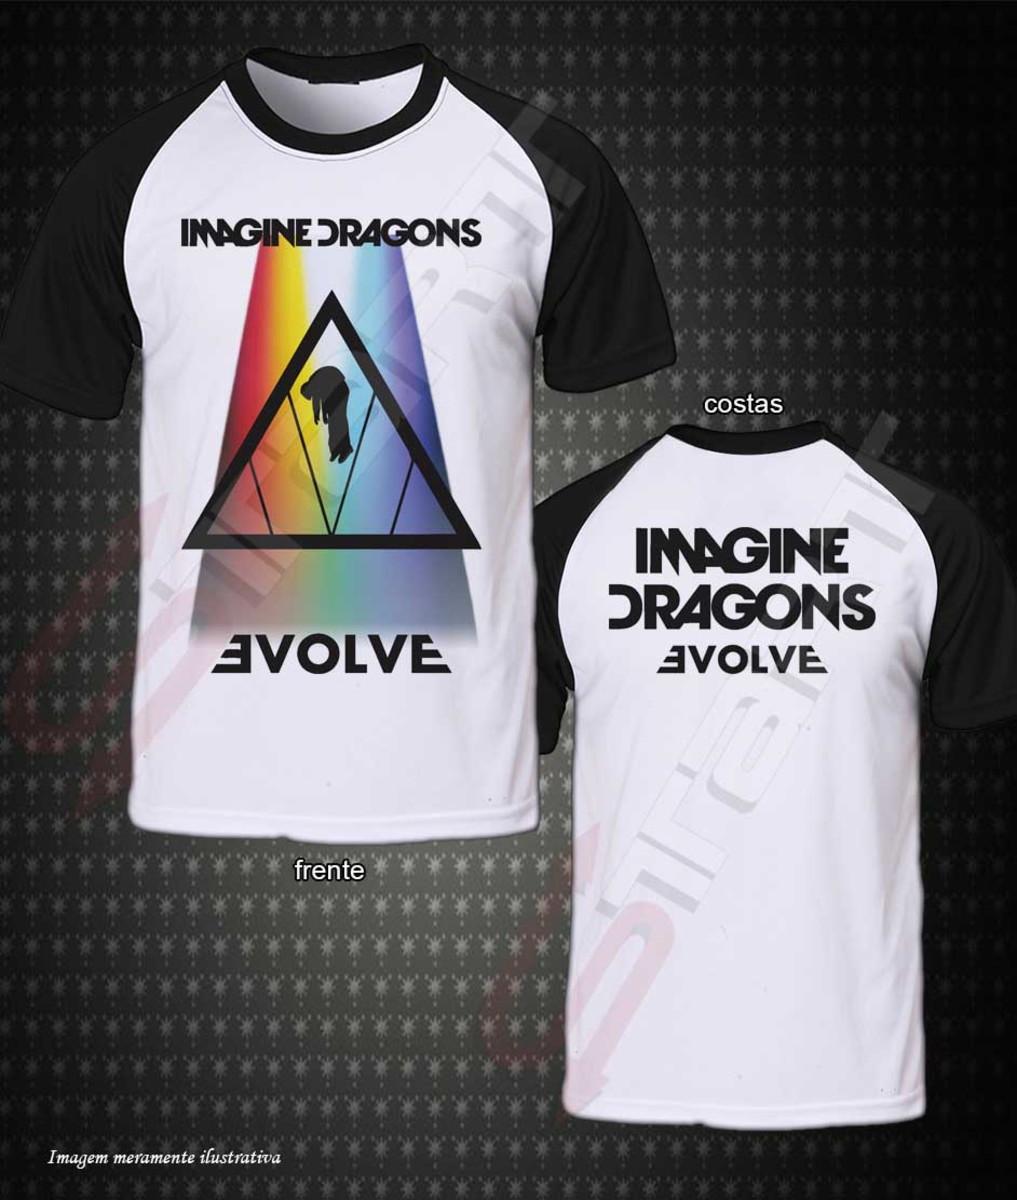 48b32f7f4a Camiseta Raglan Imagine Dragons Evolve no Elo7